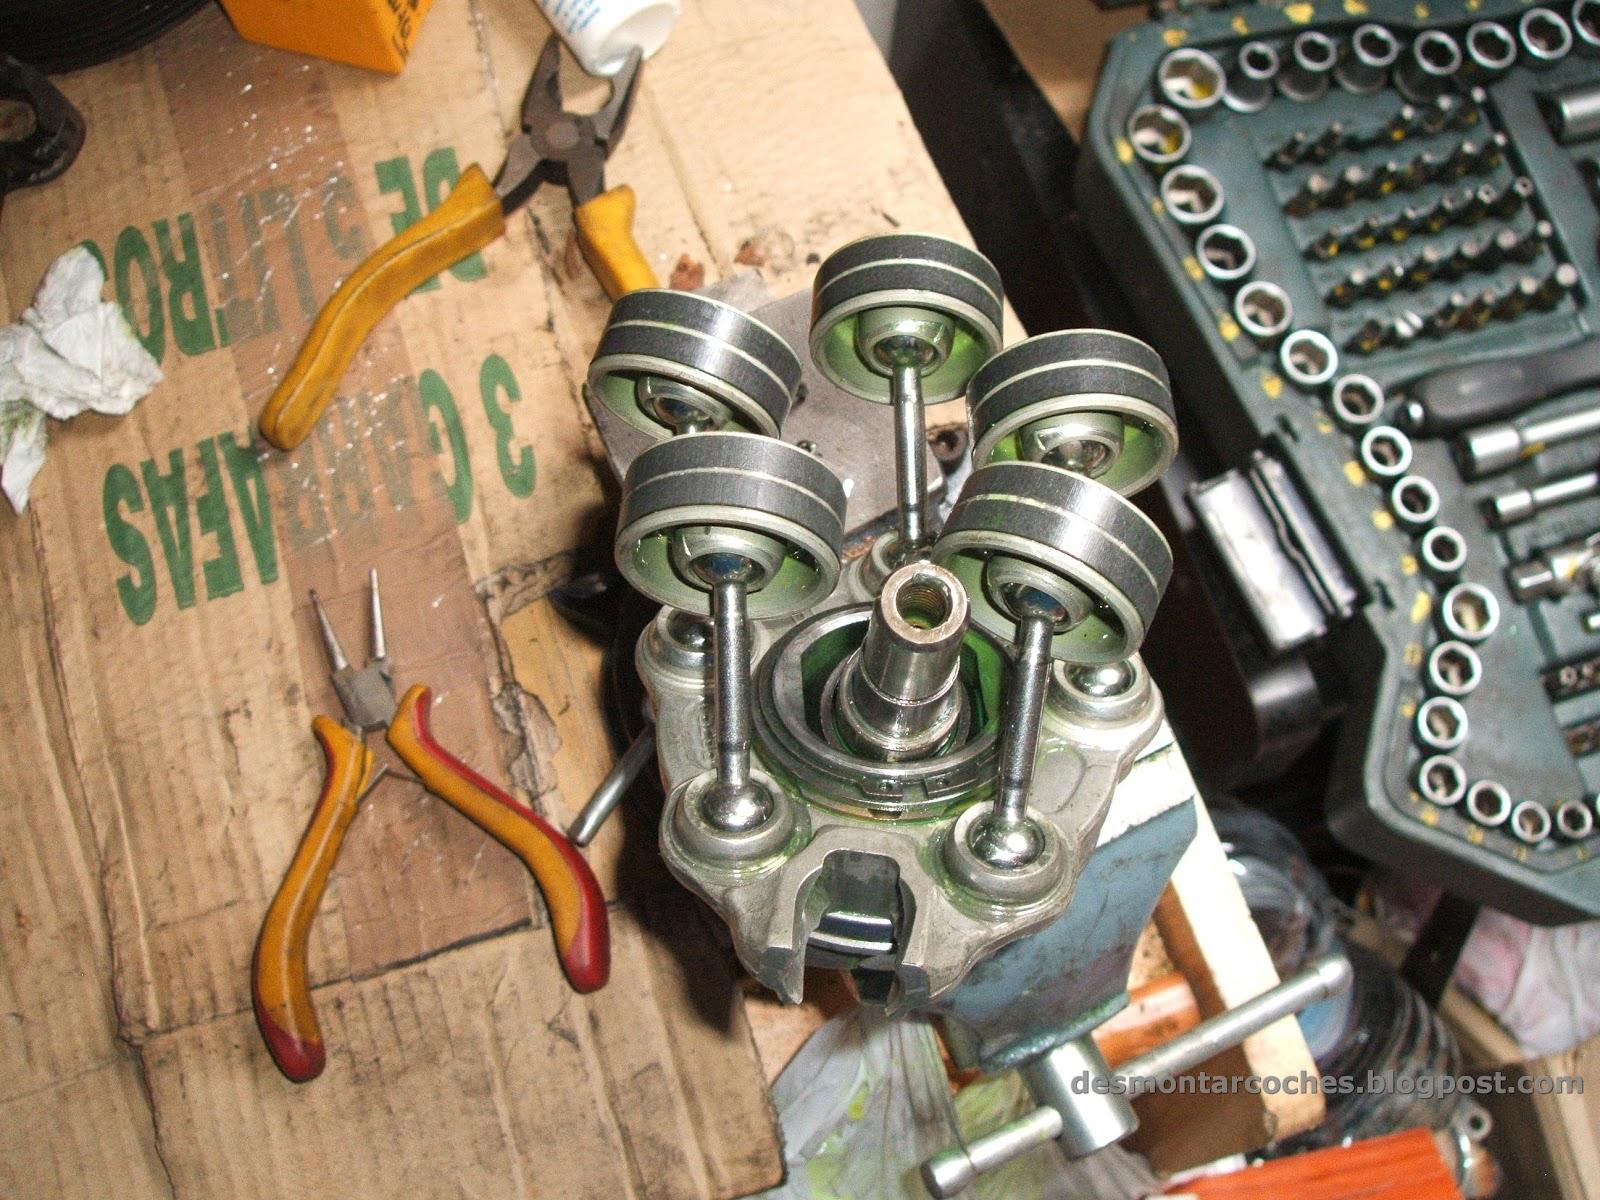 Desmontar coches fotos de tipos de compresores de aire for Como montar un aire acondicionado